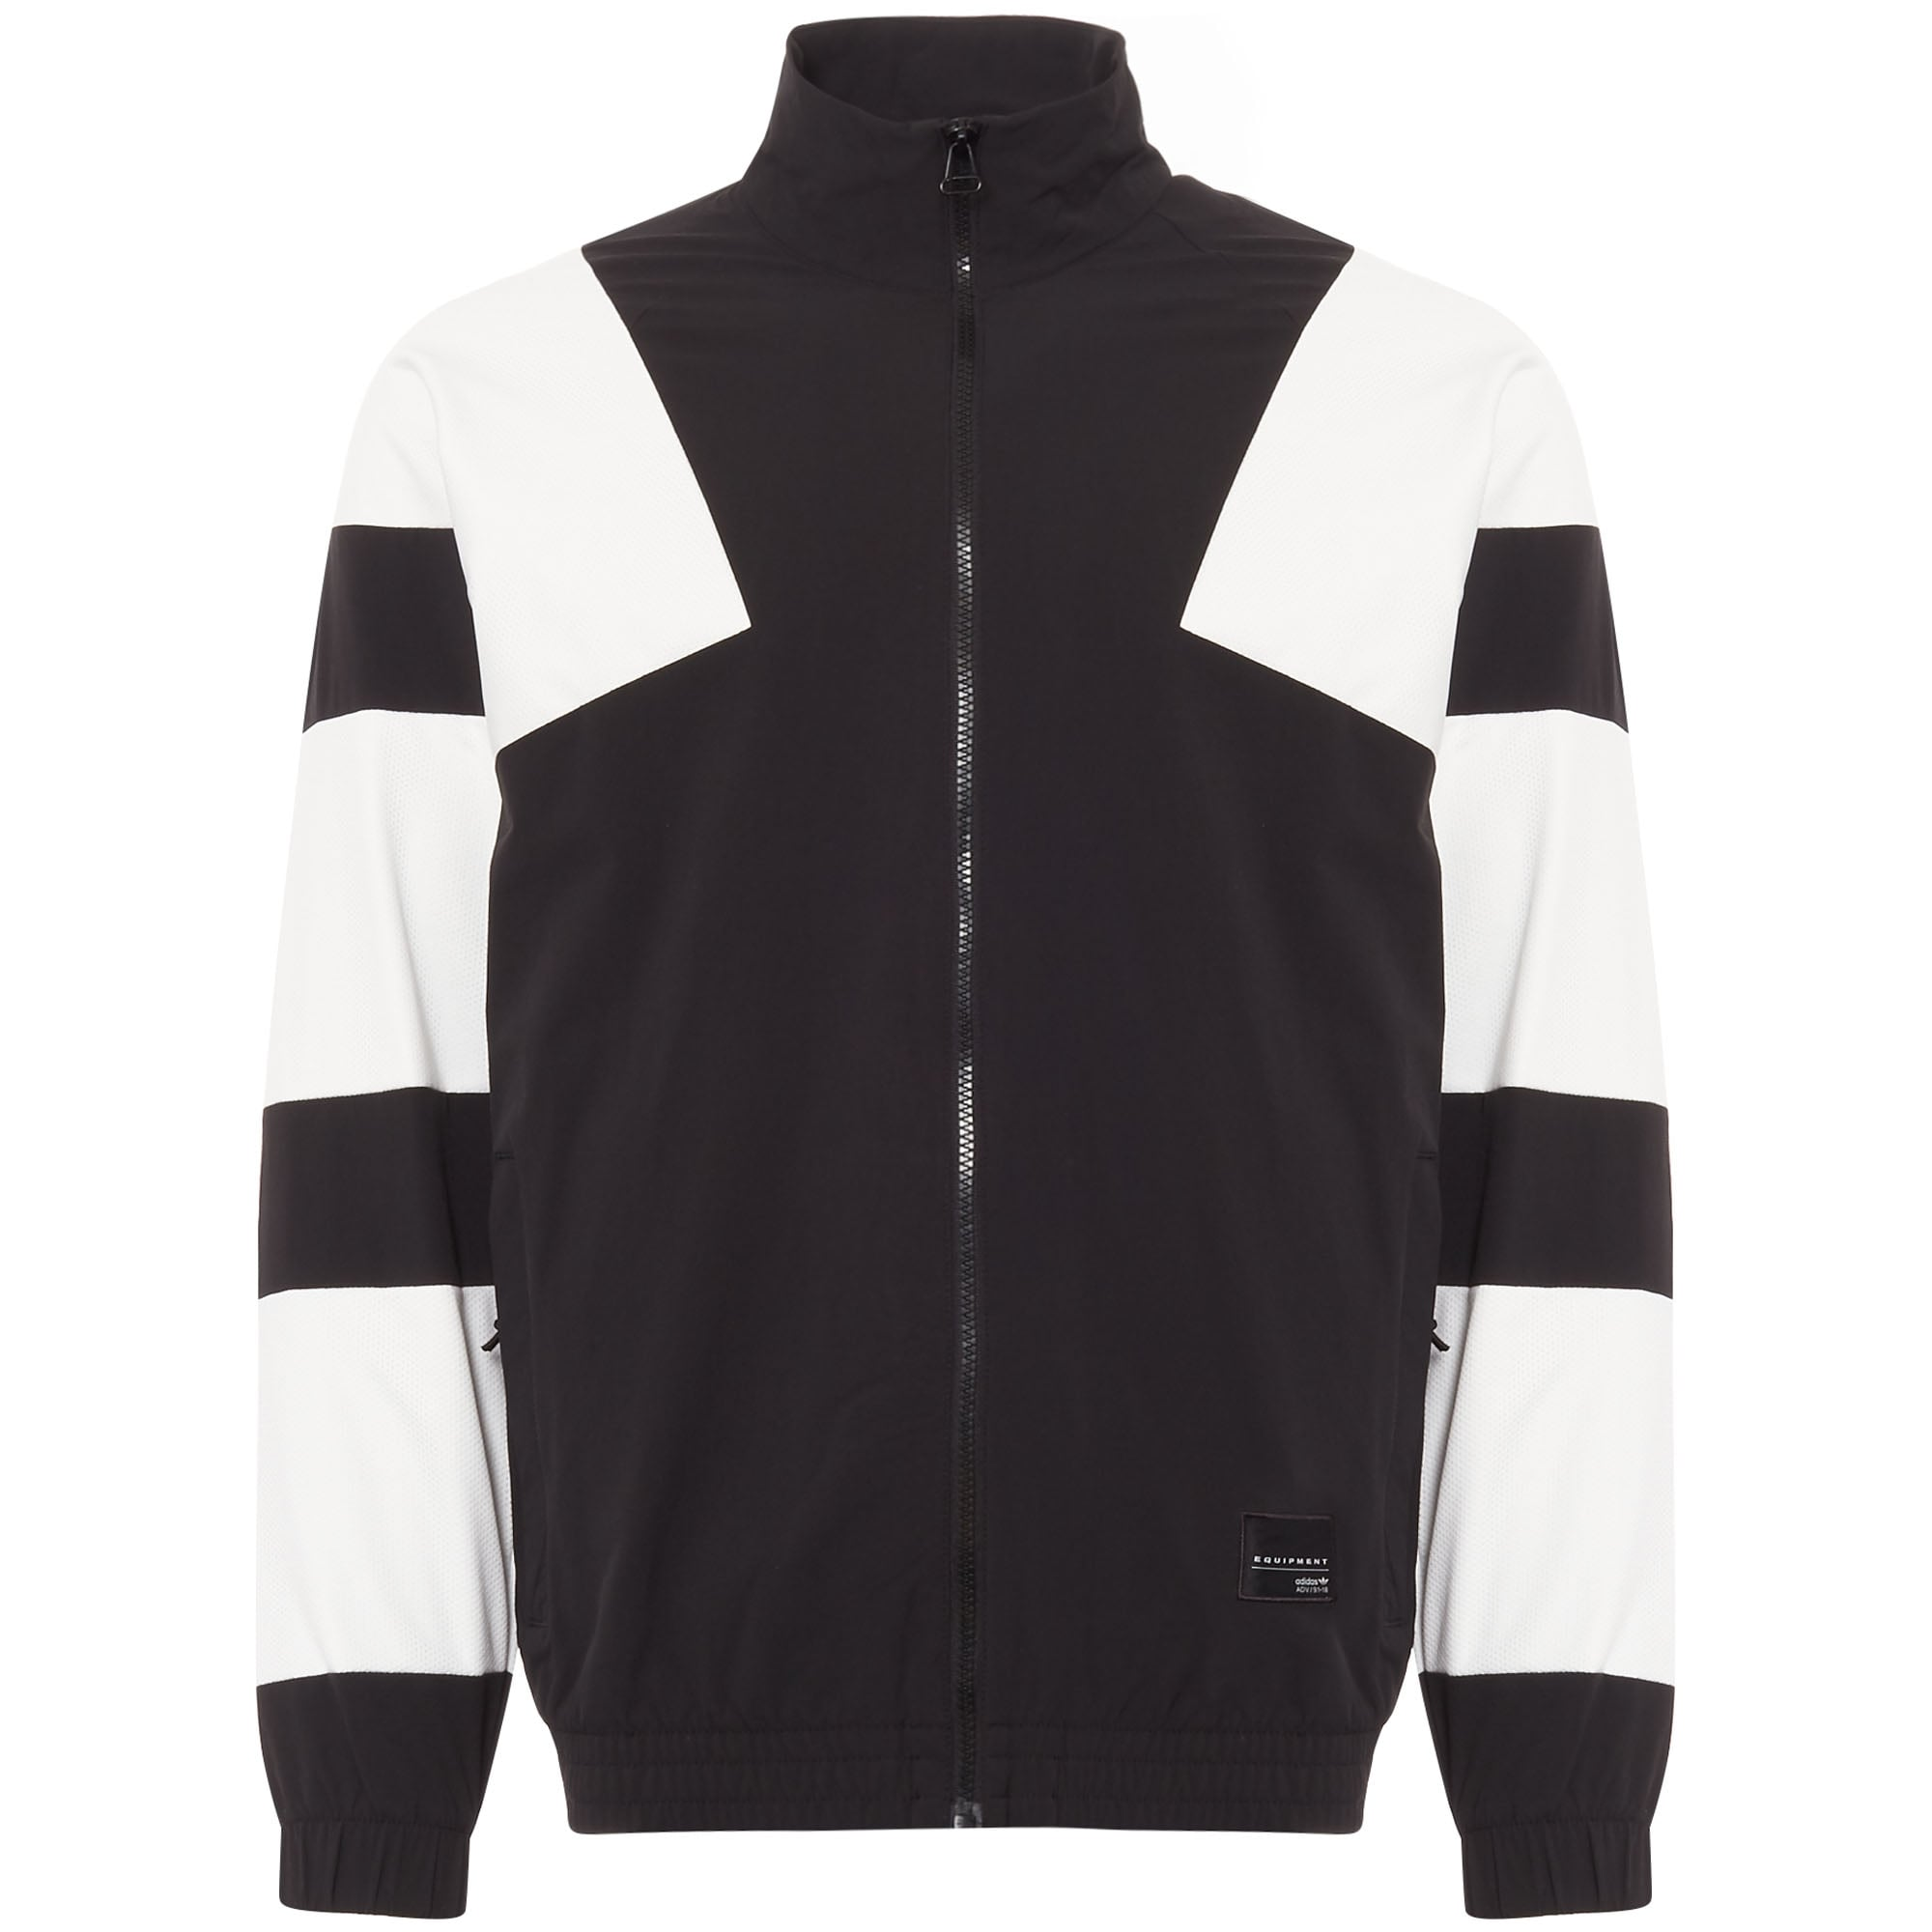 Adidas Black \u0026 White EQT Bold 2.0 Track